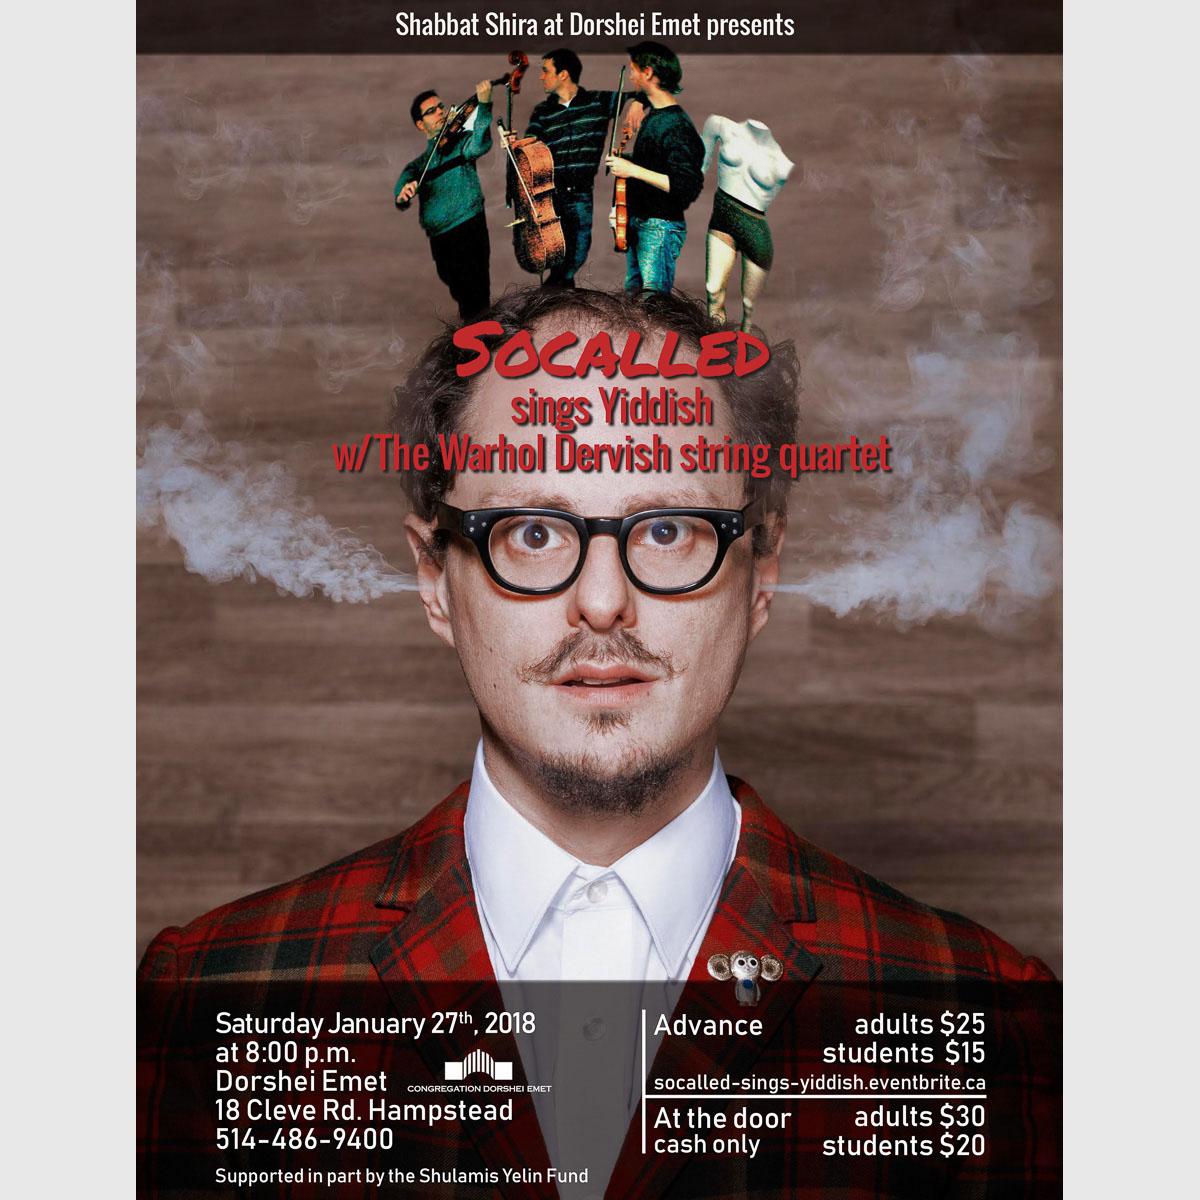 Concert poster for niche artist SoCalled